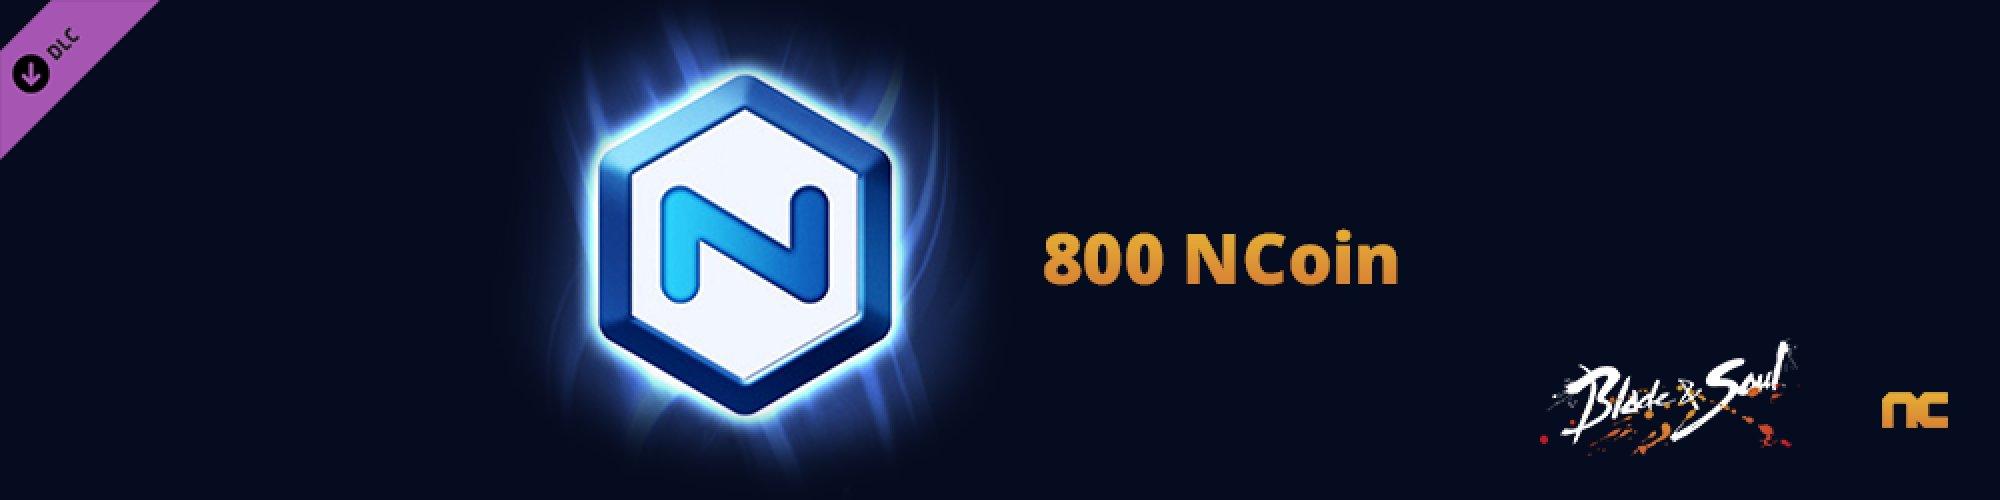 NCoin 800 banner